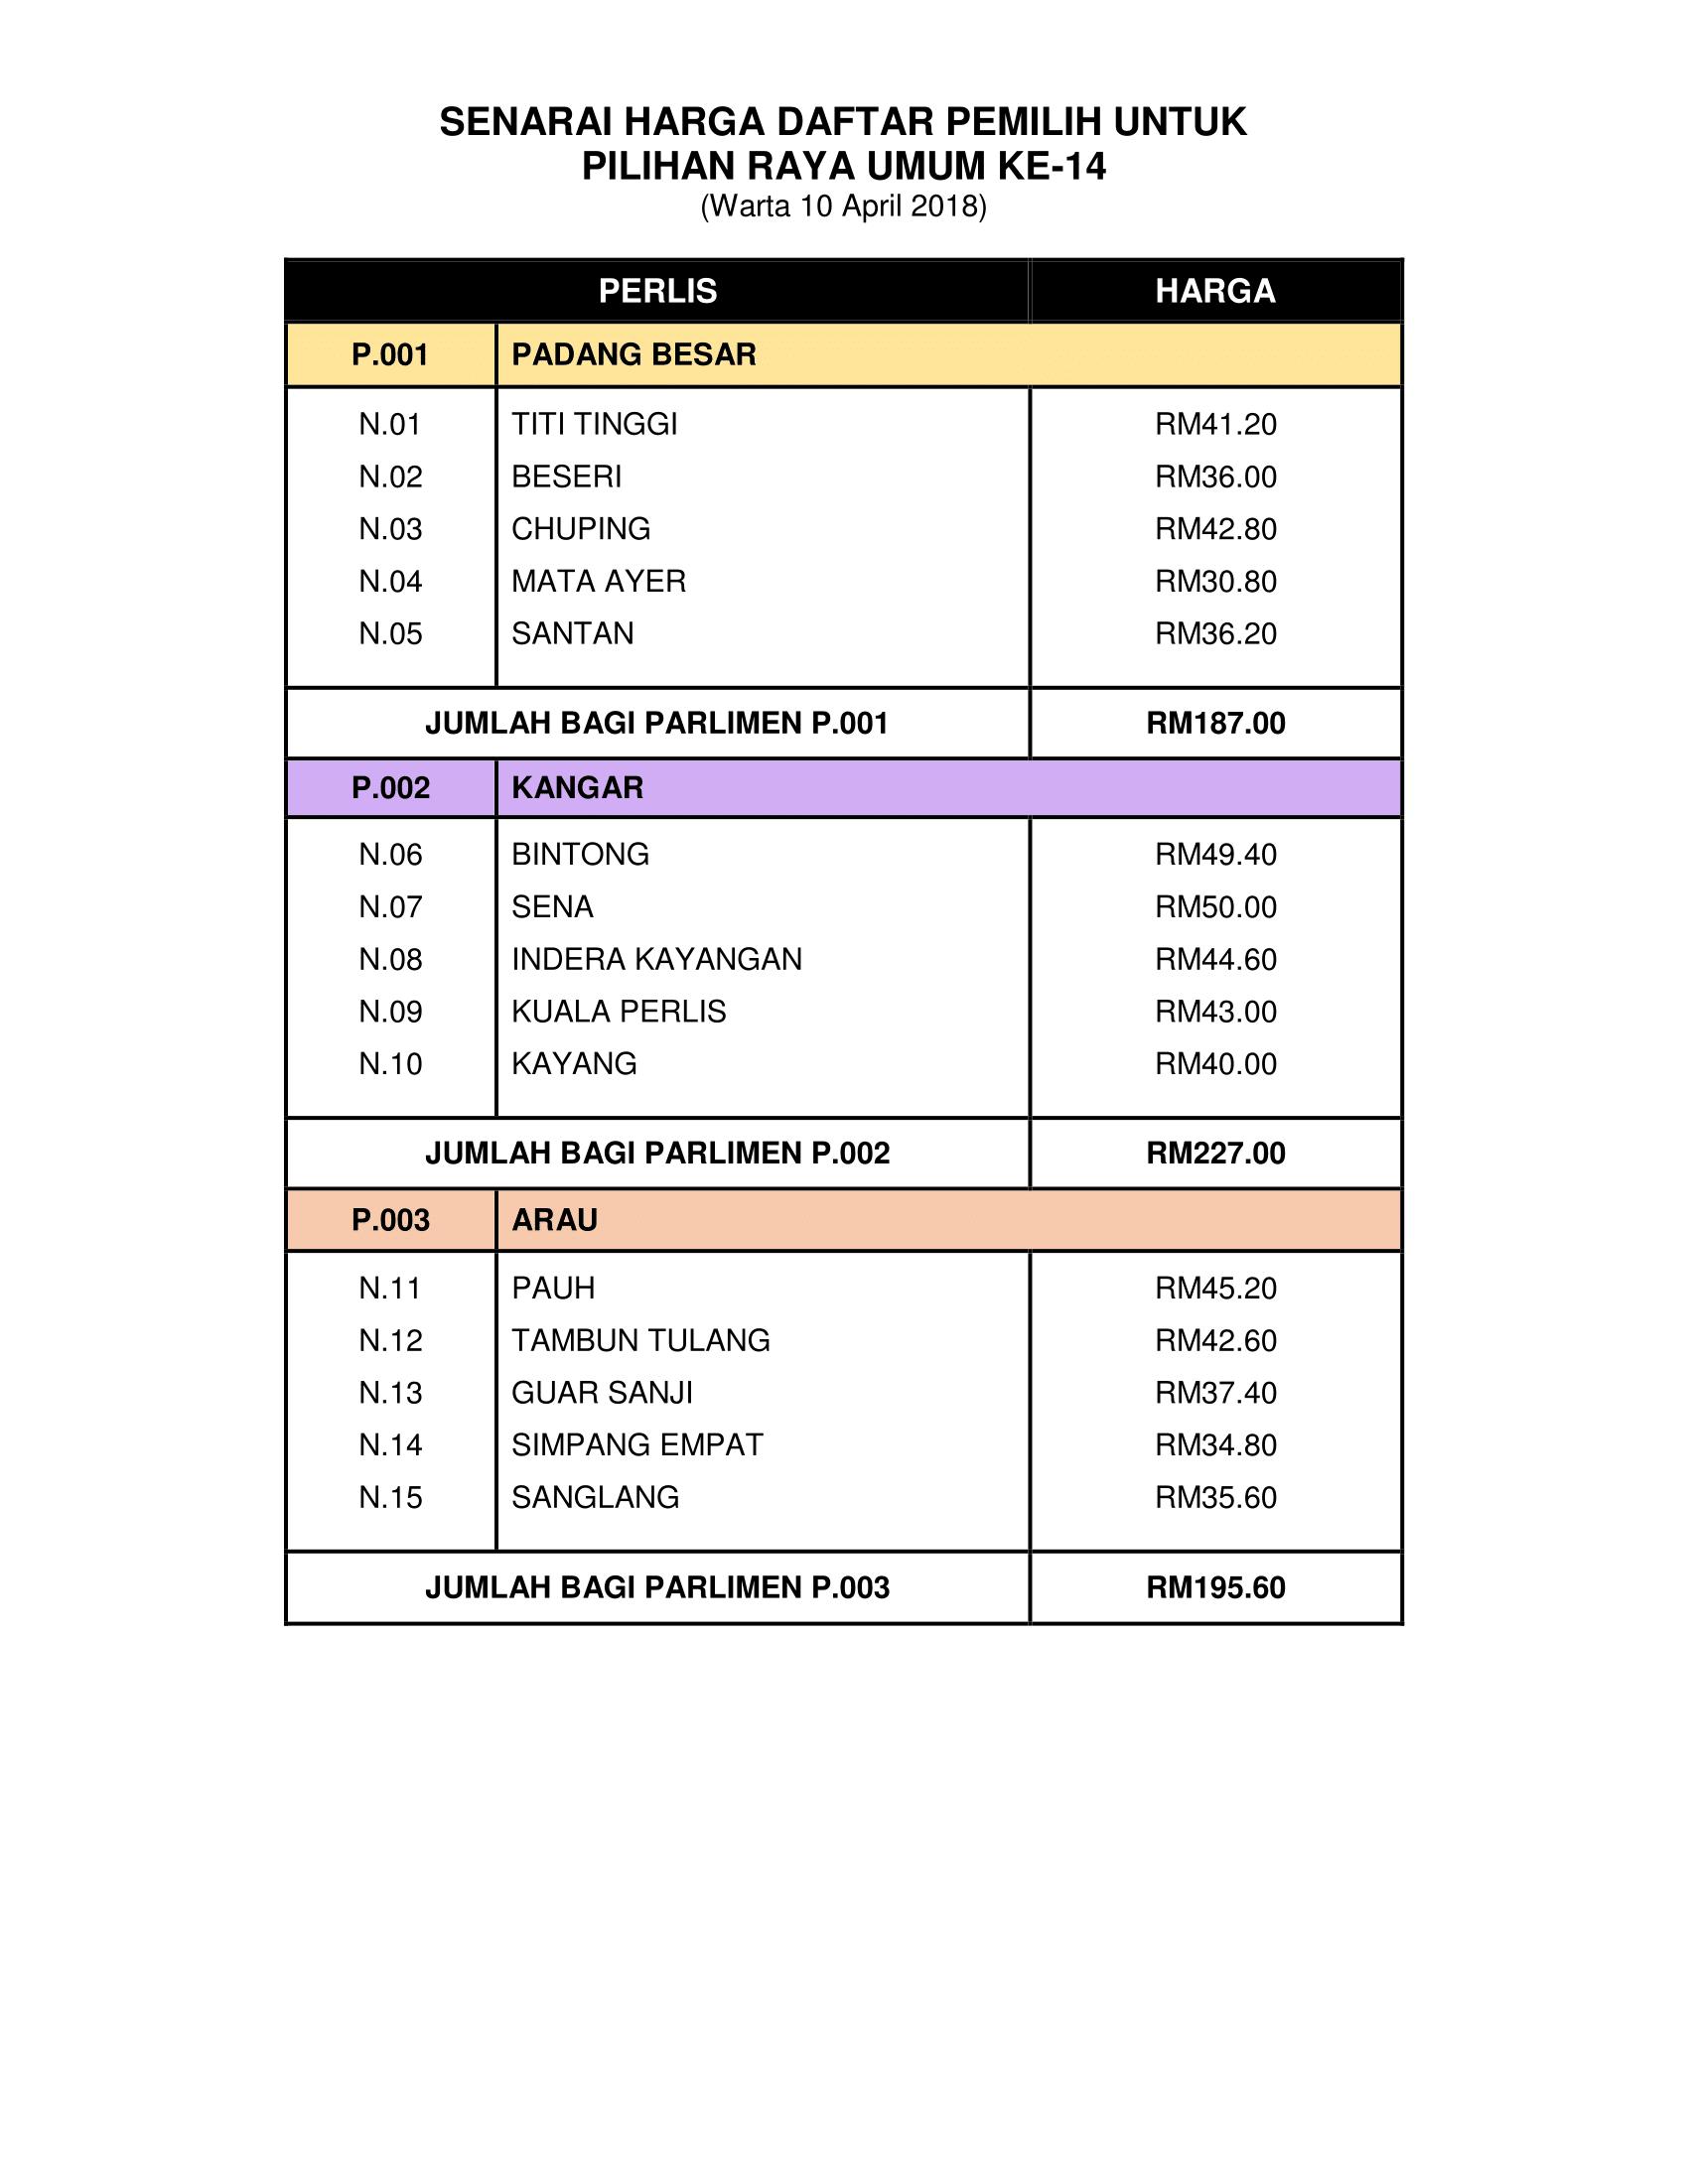 Senarai Harga Daftar Pemilih Untuk Pru Ke 14 Bagi Negeri Perlis Portal Rasmi Ppn Perlis